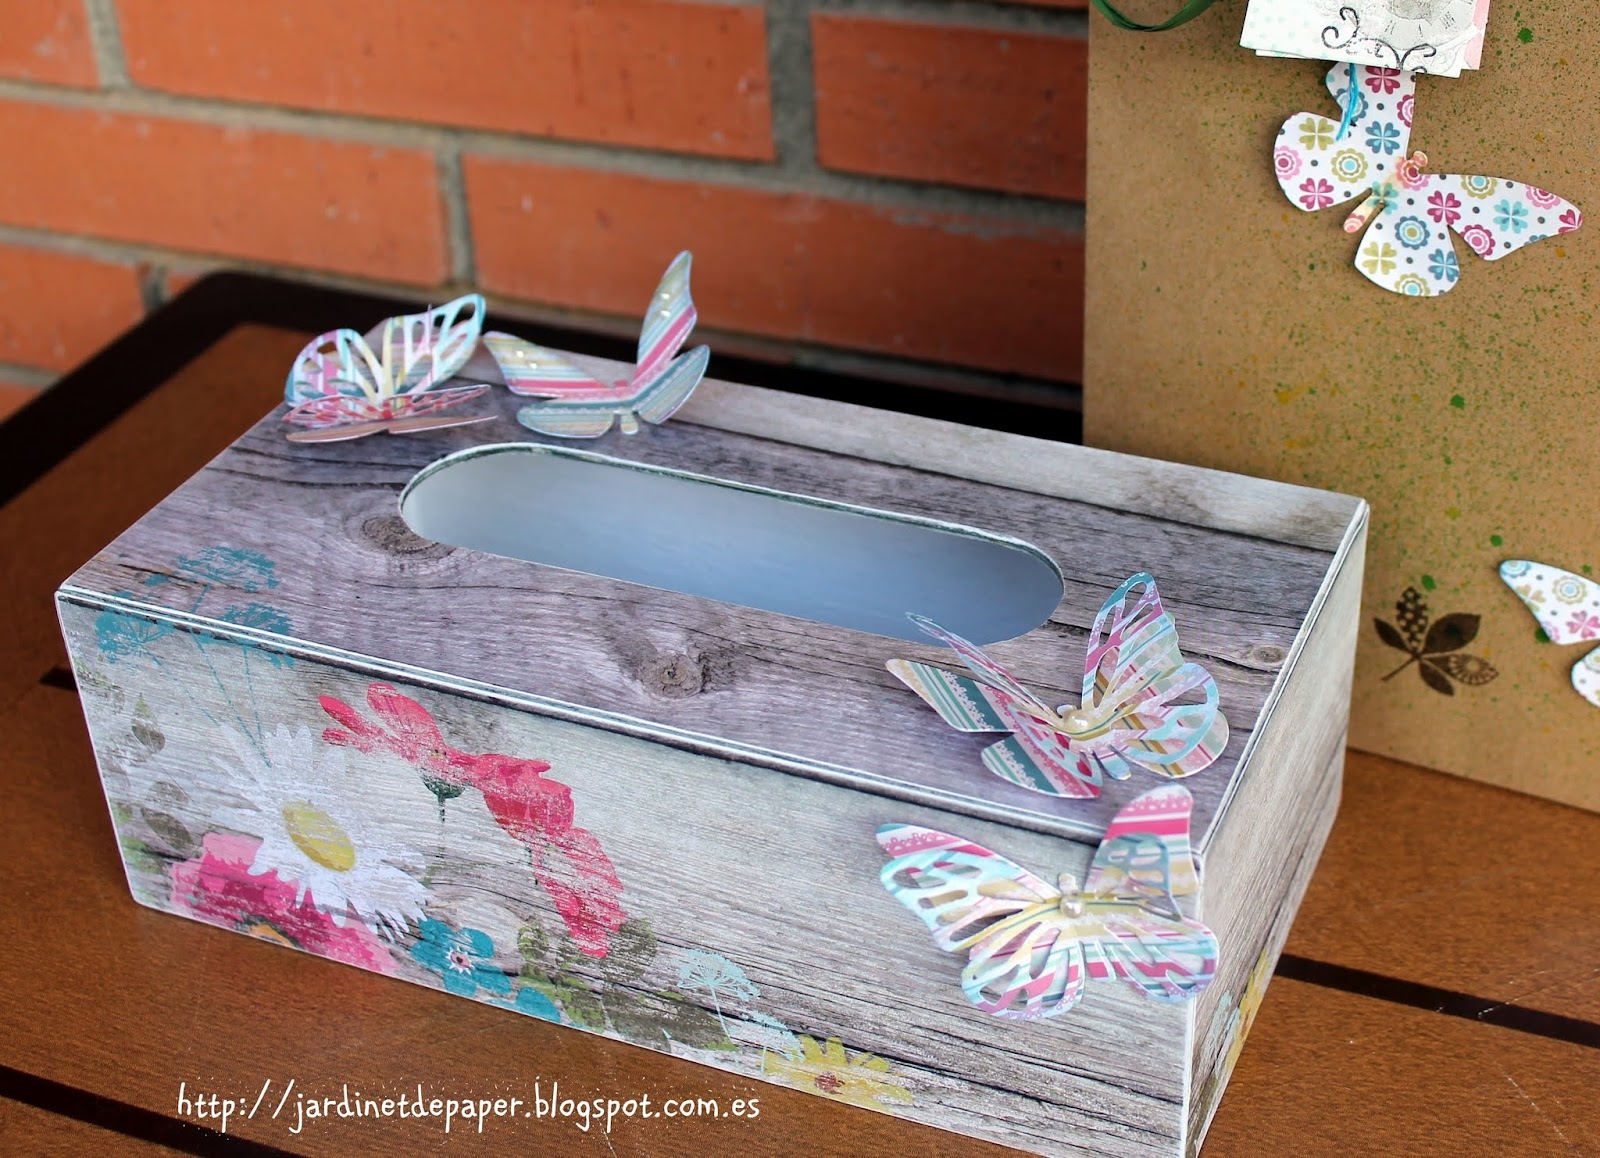 Jardinet de paper scrapbooking caja de cleenex decorada - Cajas forradas de papel ...